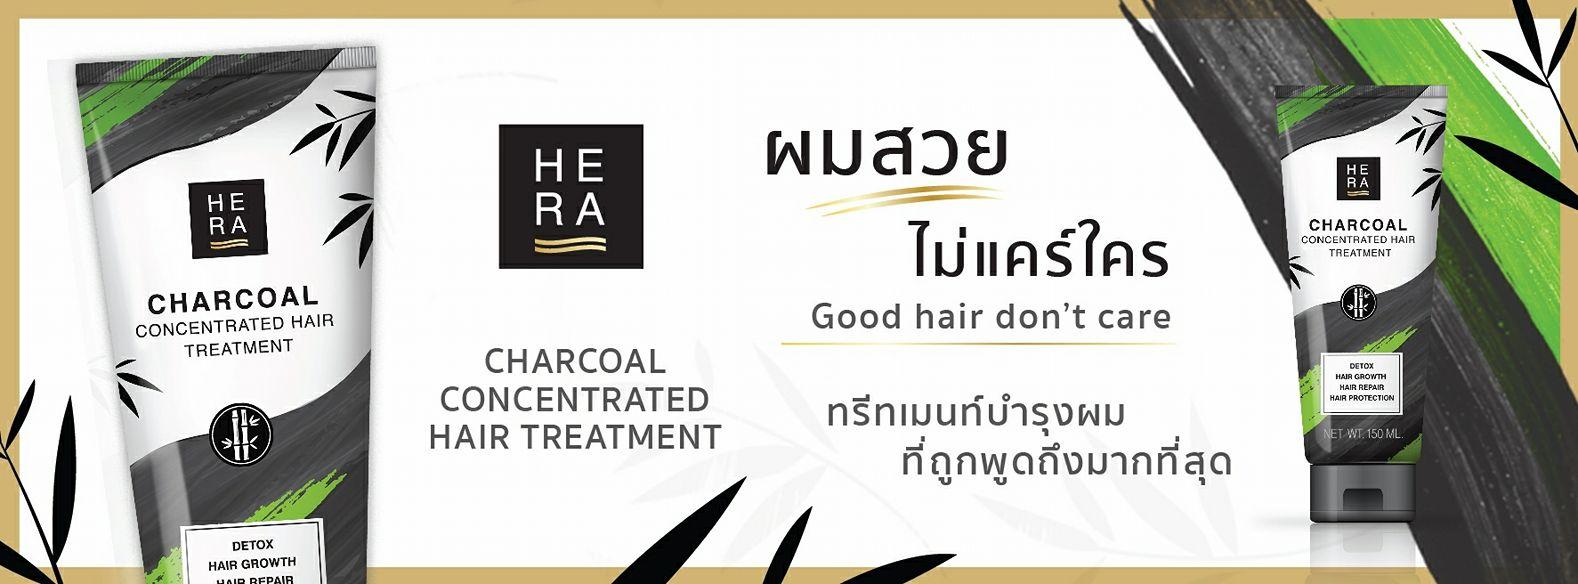 HERA Charcoal Treatment (รับตัวแทนจำหน่าย)